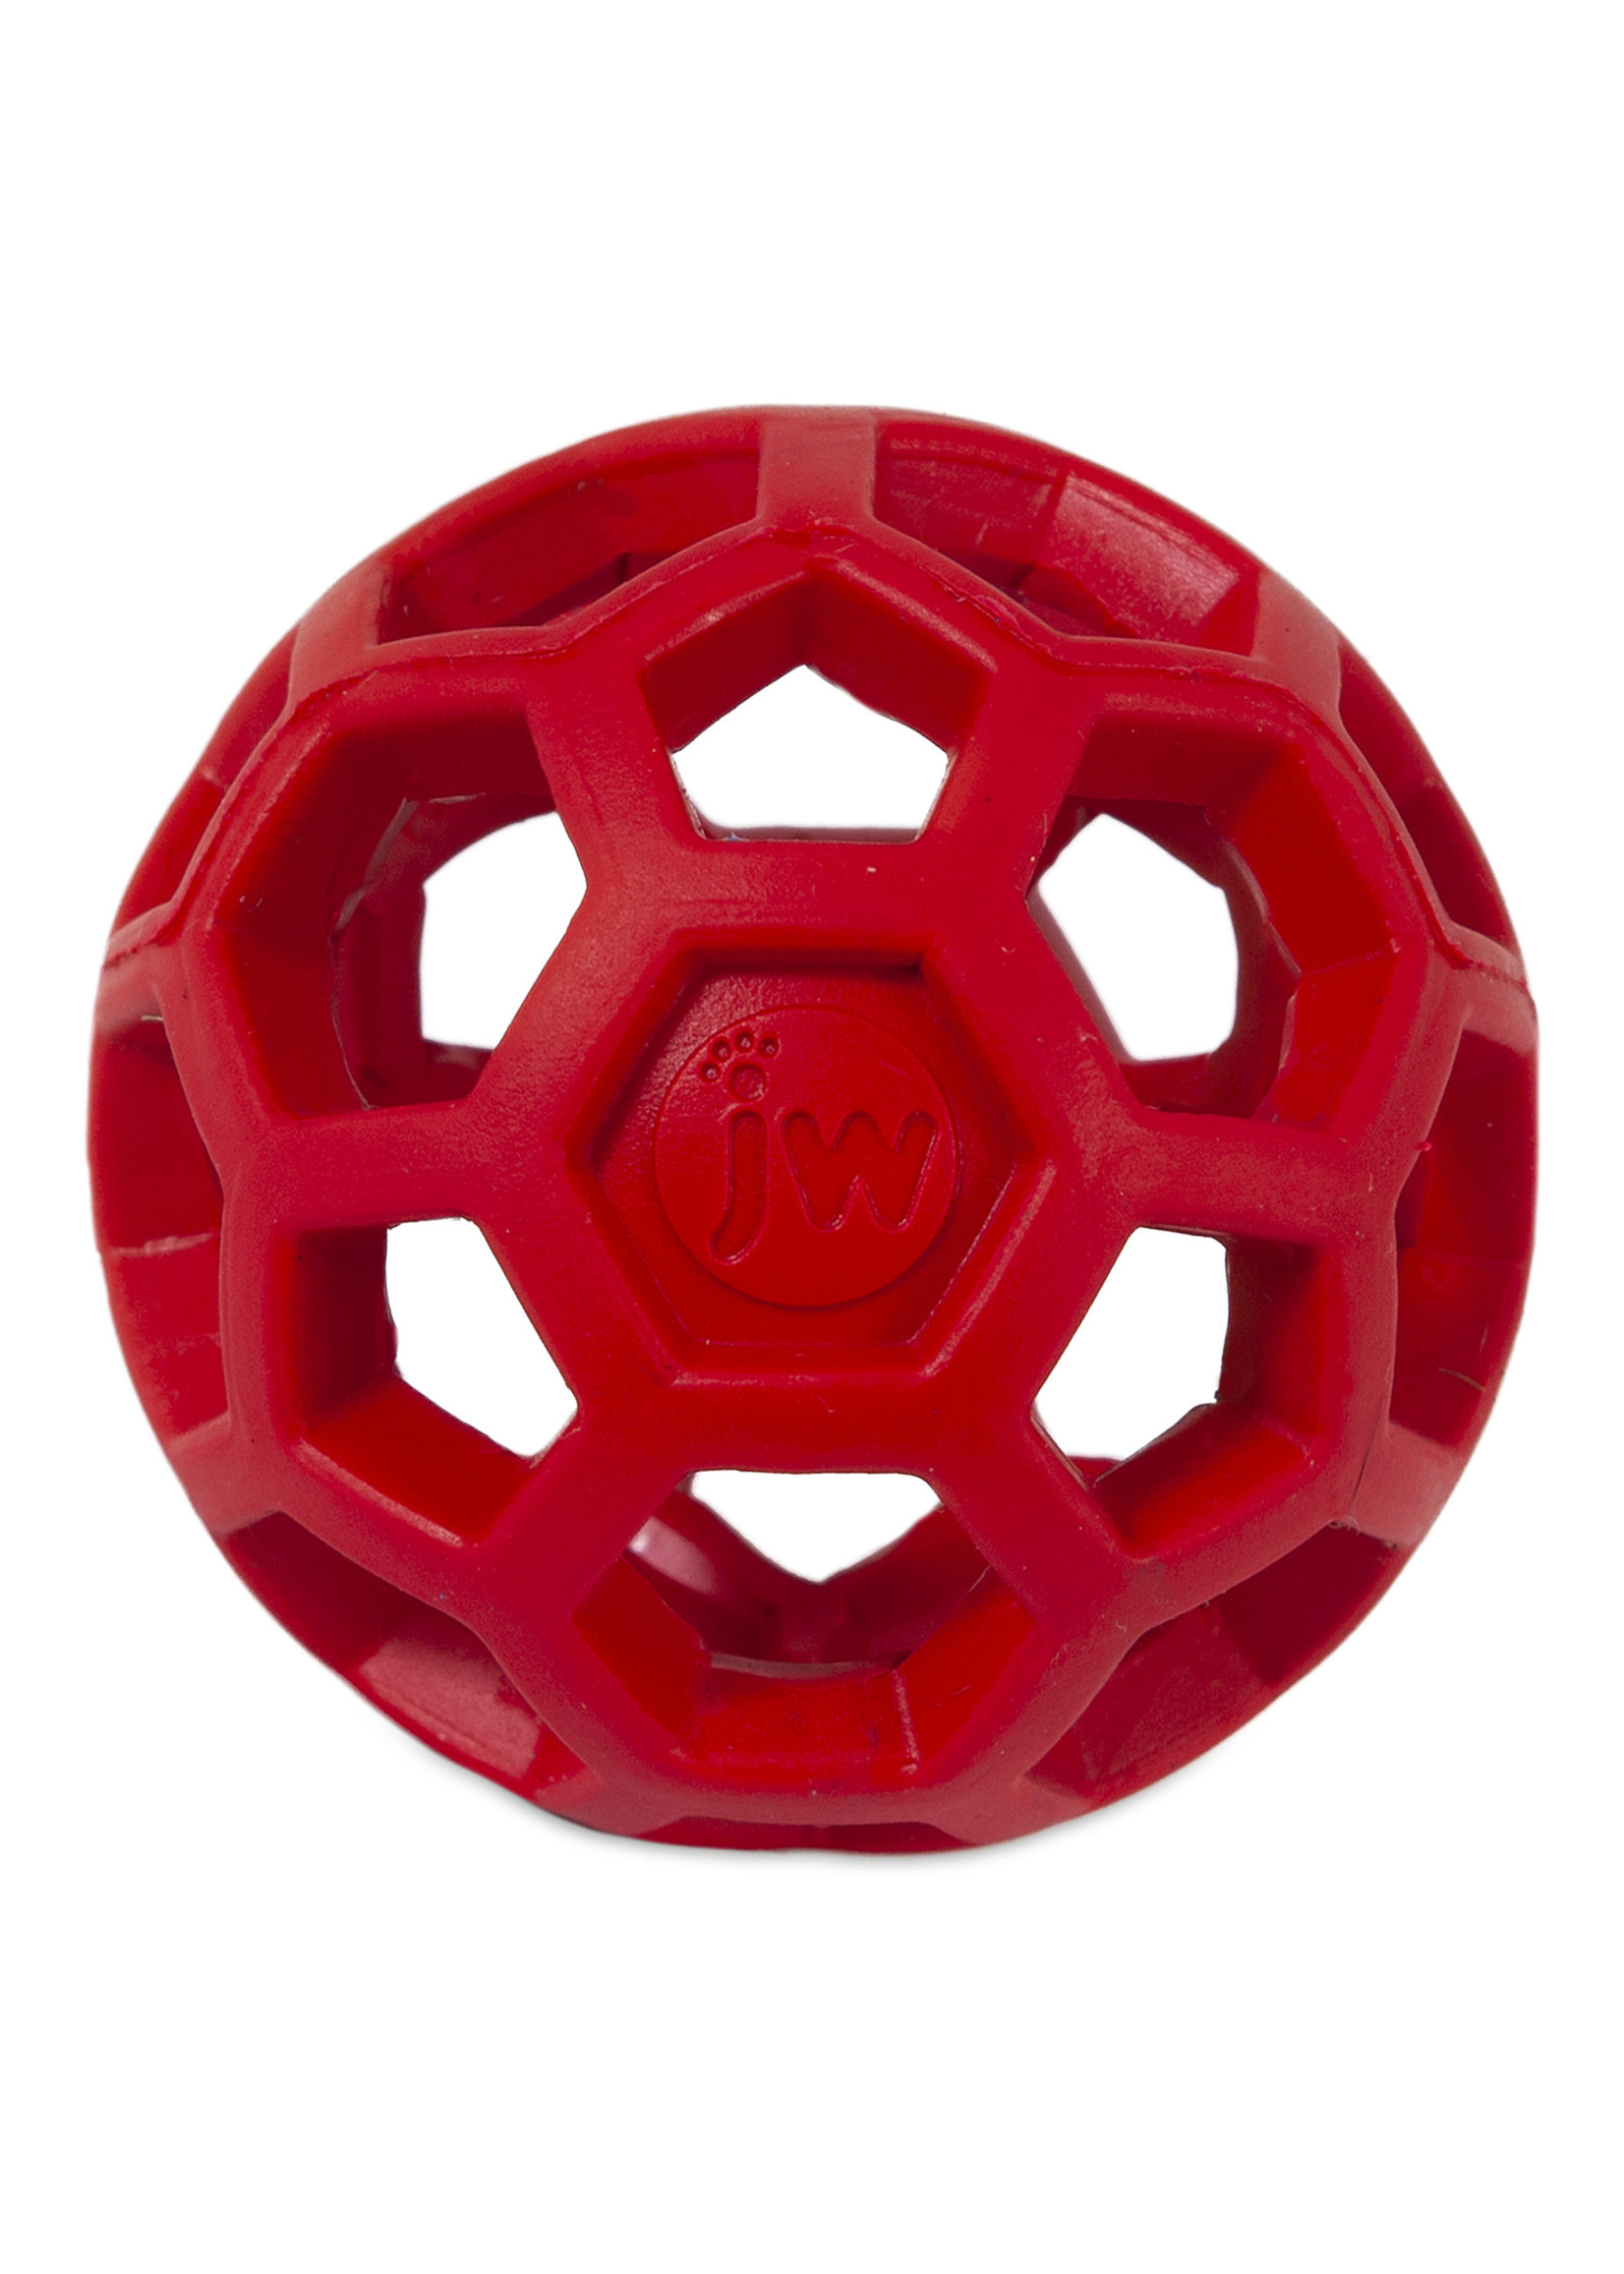 JW Pet JW Holee roller mini